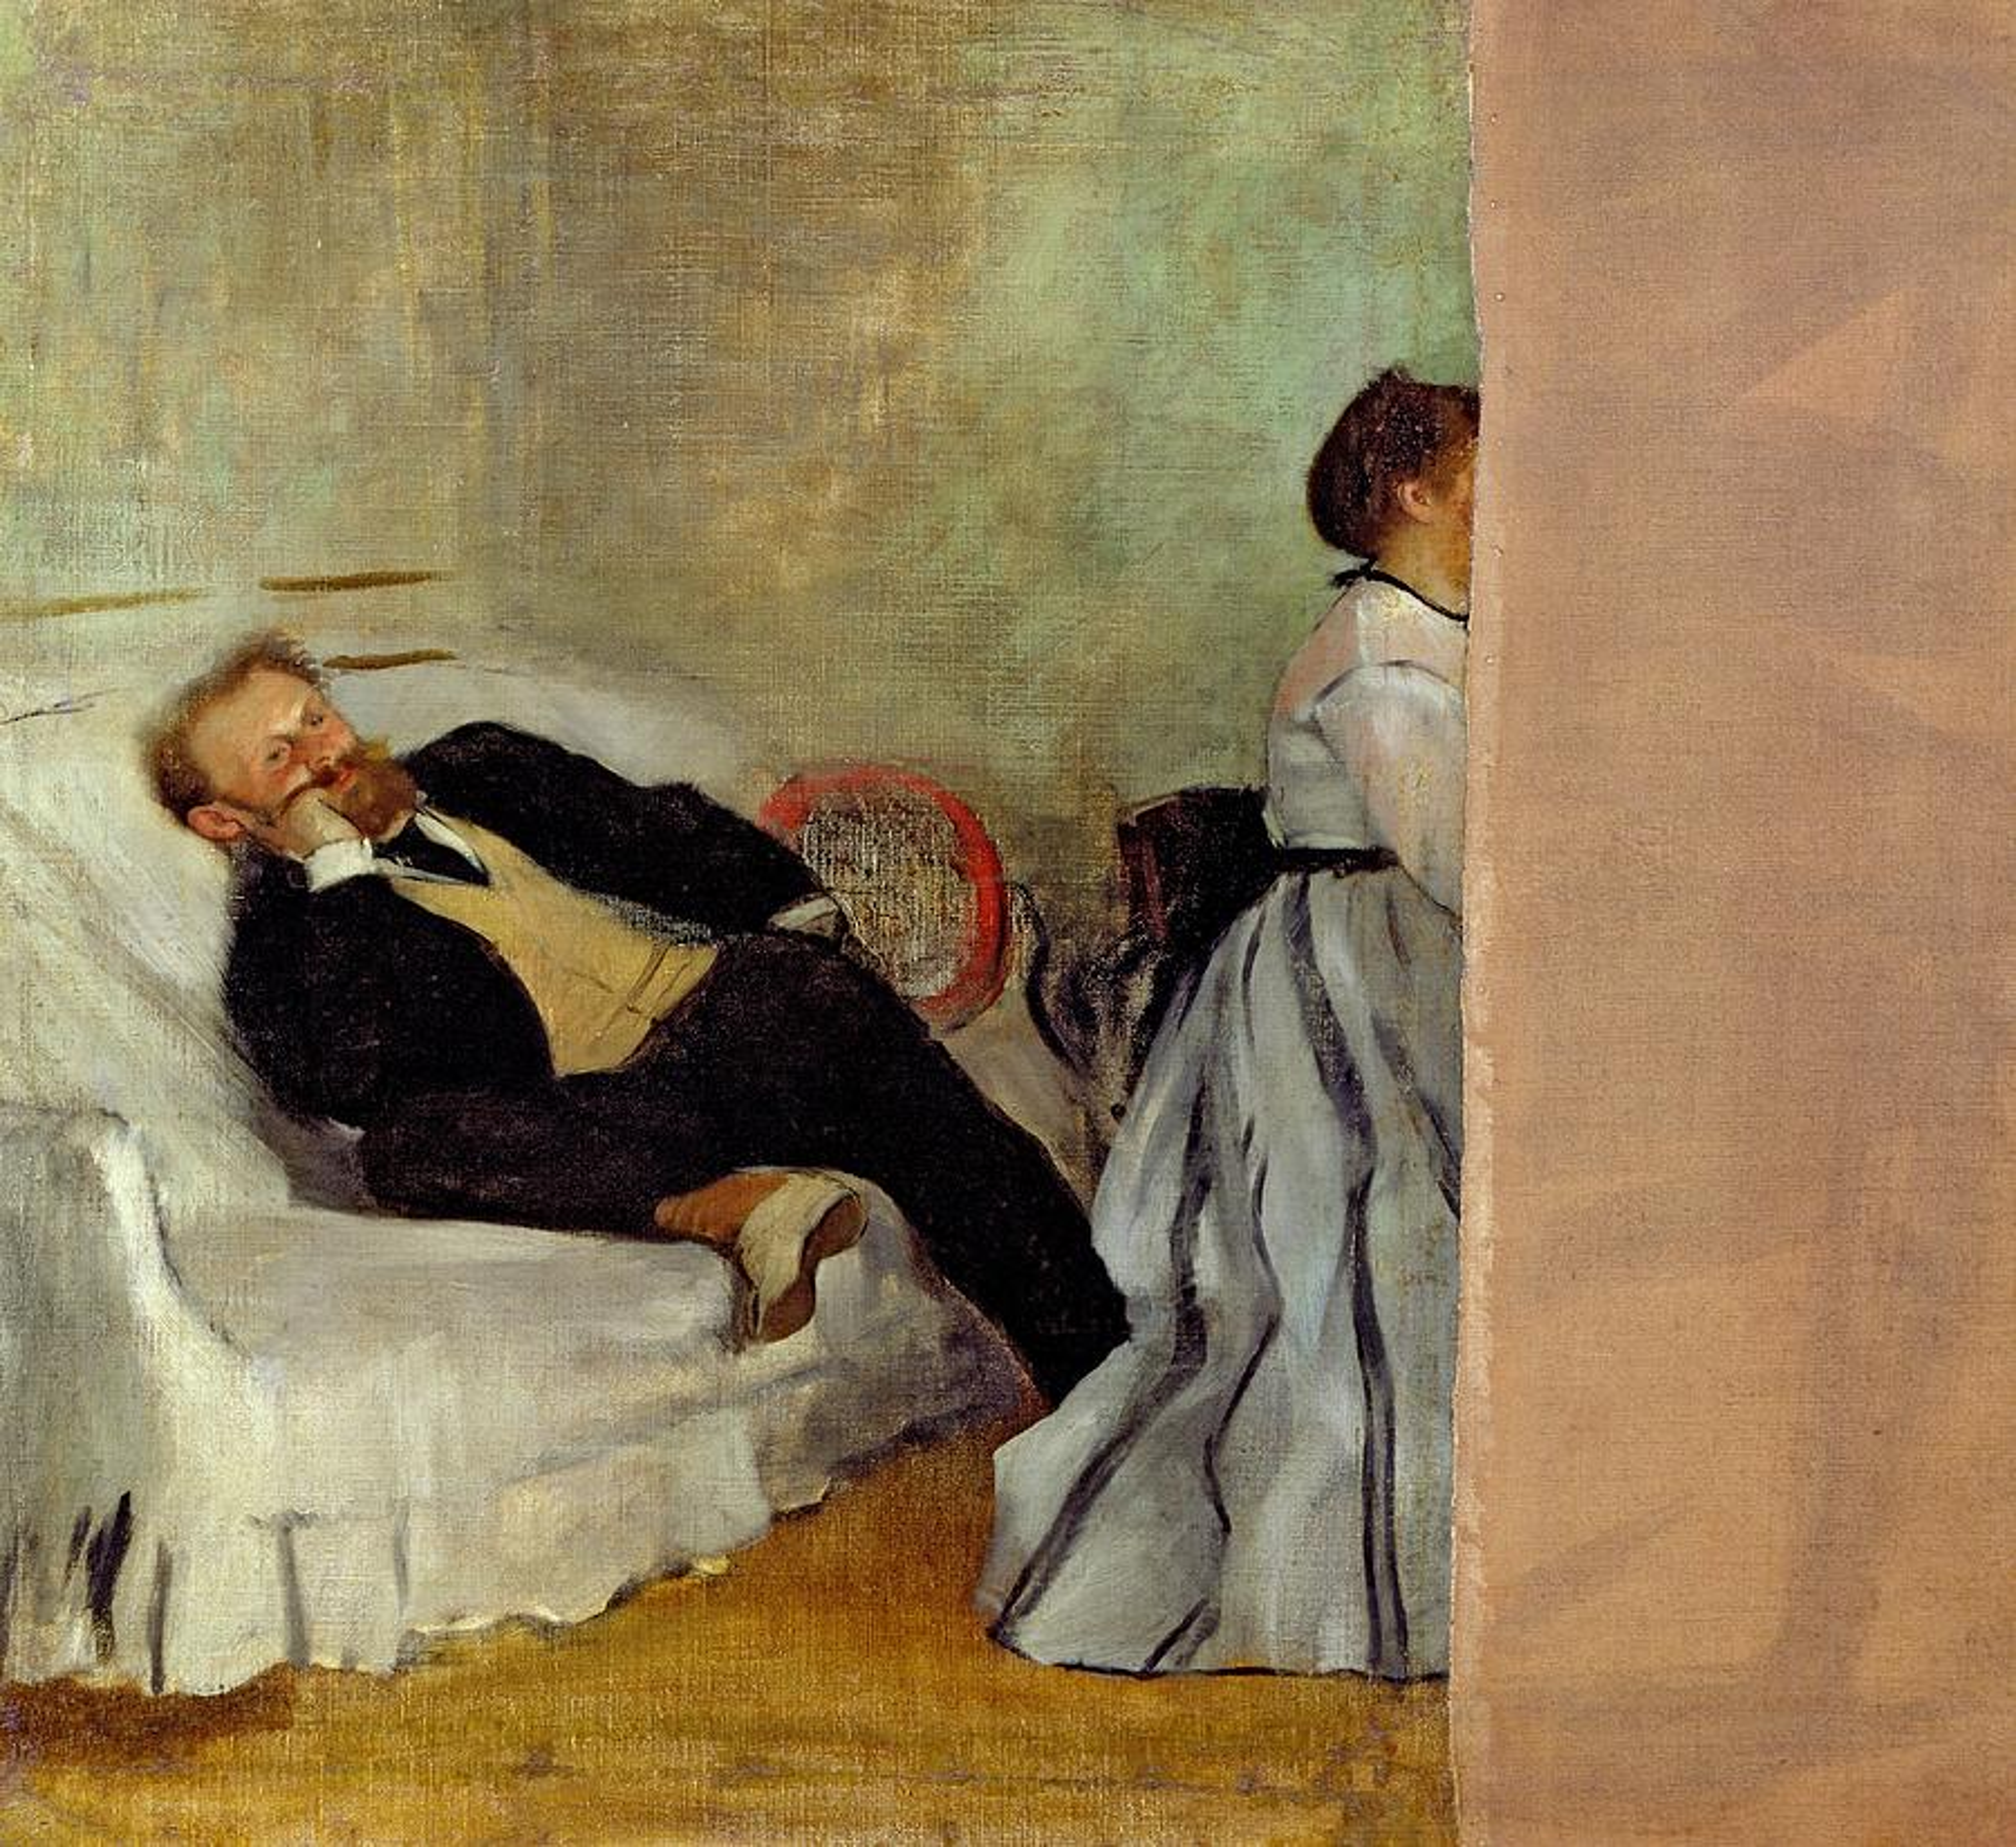 Edgar Degas - Monsieur et Madame Edouard Manet